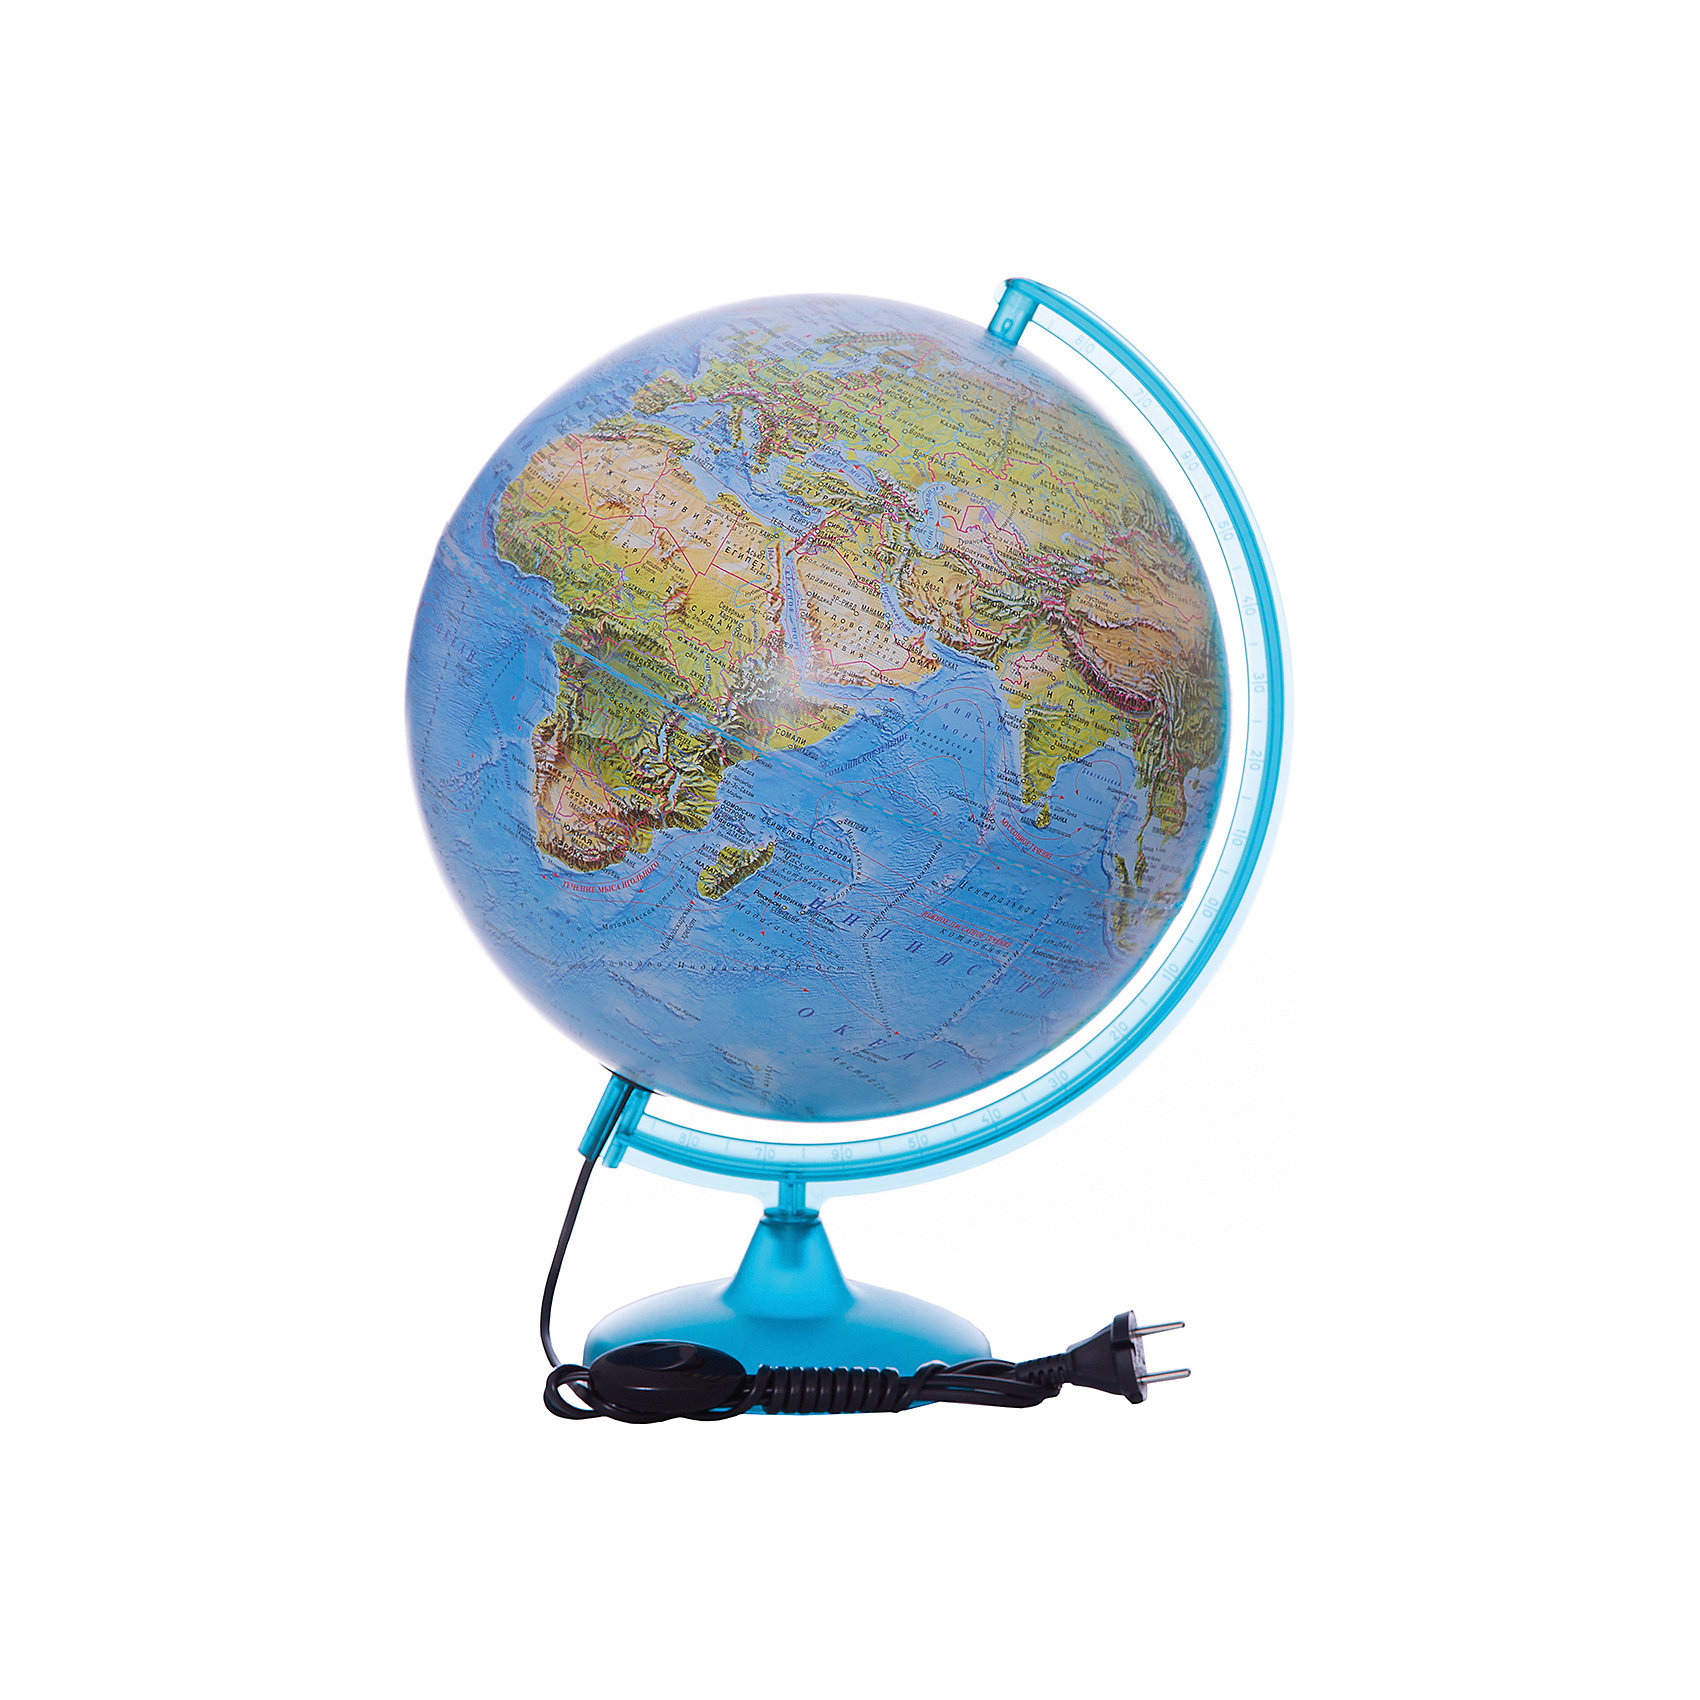 Глобус Земли «Двойная карта» с подсветкой, диаметр 320 ммДиаметр: 320 мм<br><br>Масштаб: 1:40000000<br><br>Материал подставки: Пластик<br><br>Цвет подставки: Черный<br><br>Ширина мм: 343<br>Глубина мм: 343<br>Высота мм: 355<br>Вес г: 1035<br>Возраст от месяцев: 72<br>Возраст до месяцев: 2147483647<br>Пол: Унисекс<br>Возраст: Детский<br>SKU: 5518223